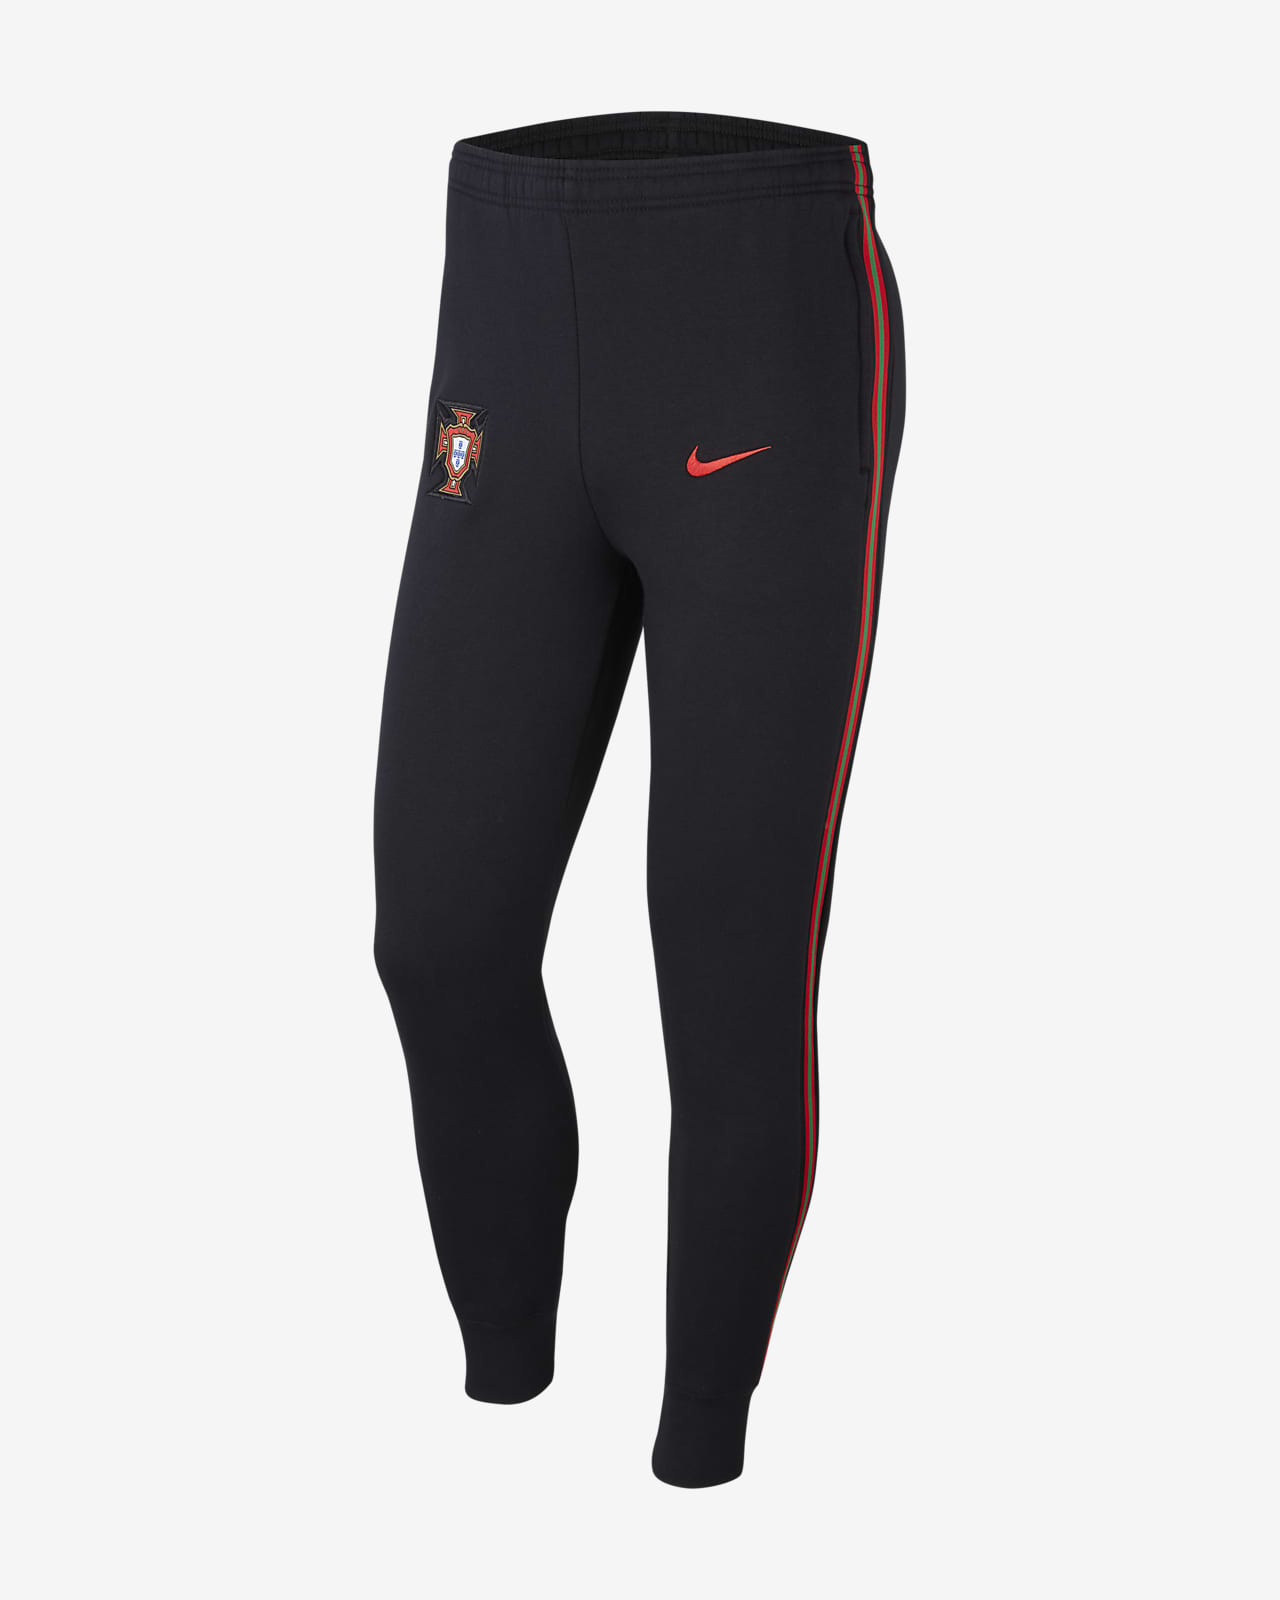 Pánské flísové fotbalové kalhoty Portugalsko